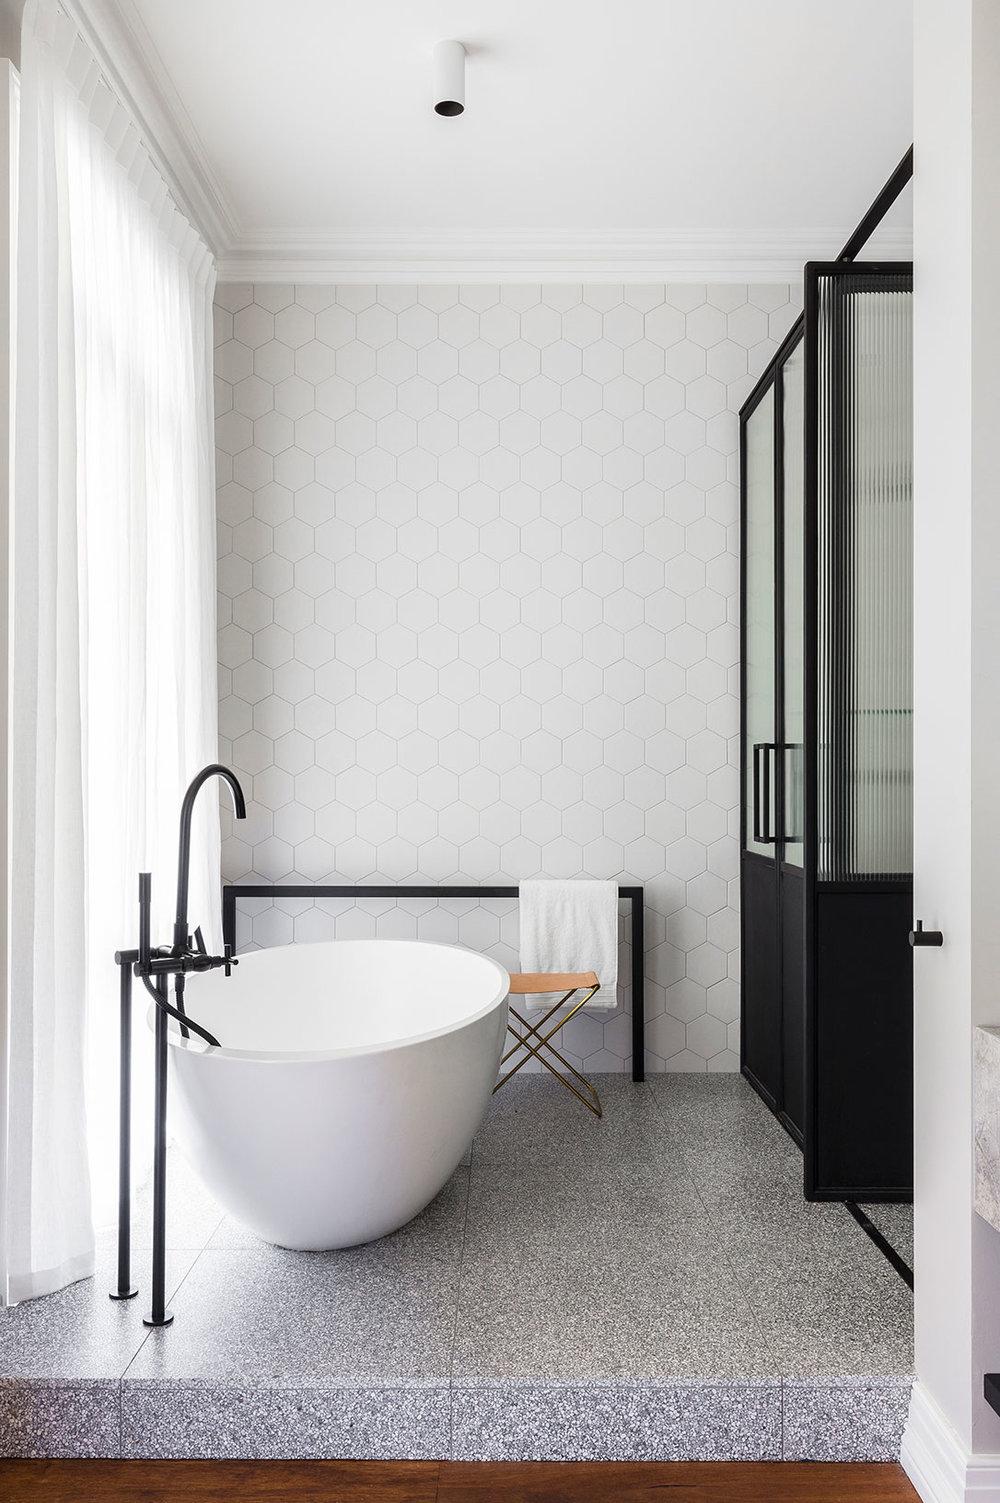 Photography Tom Ferguson / Interior design Arent&Pyke